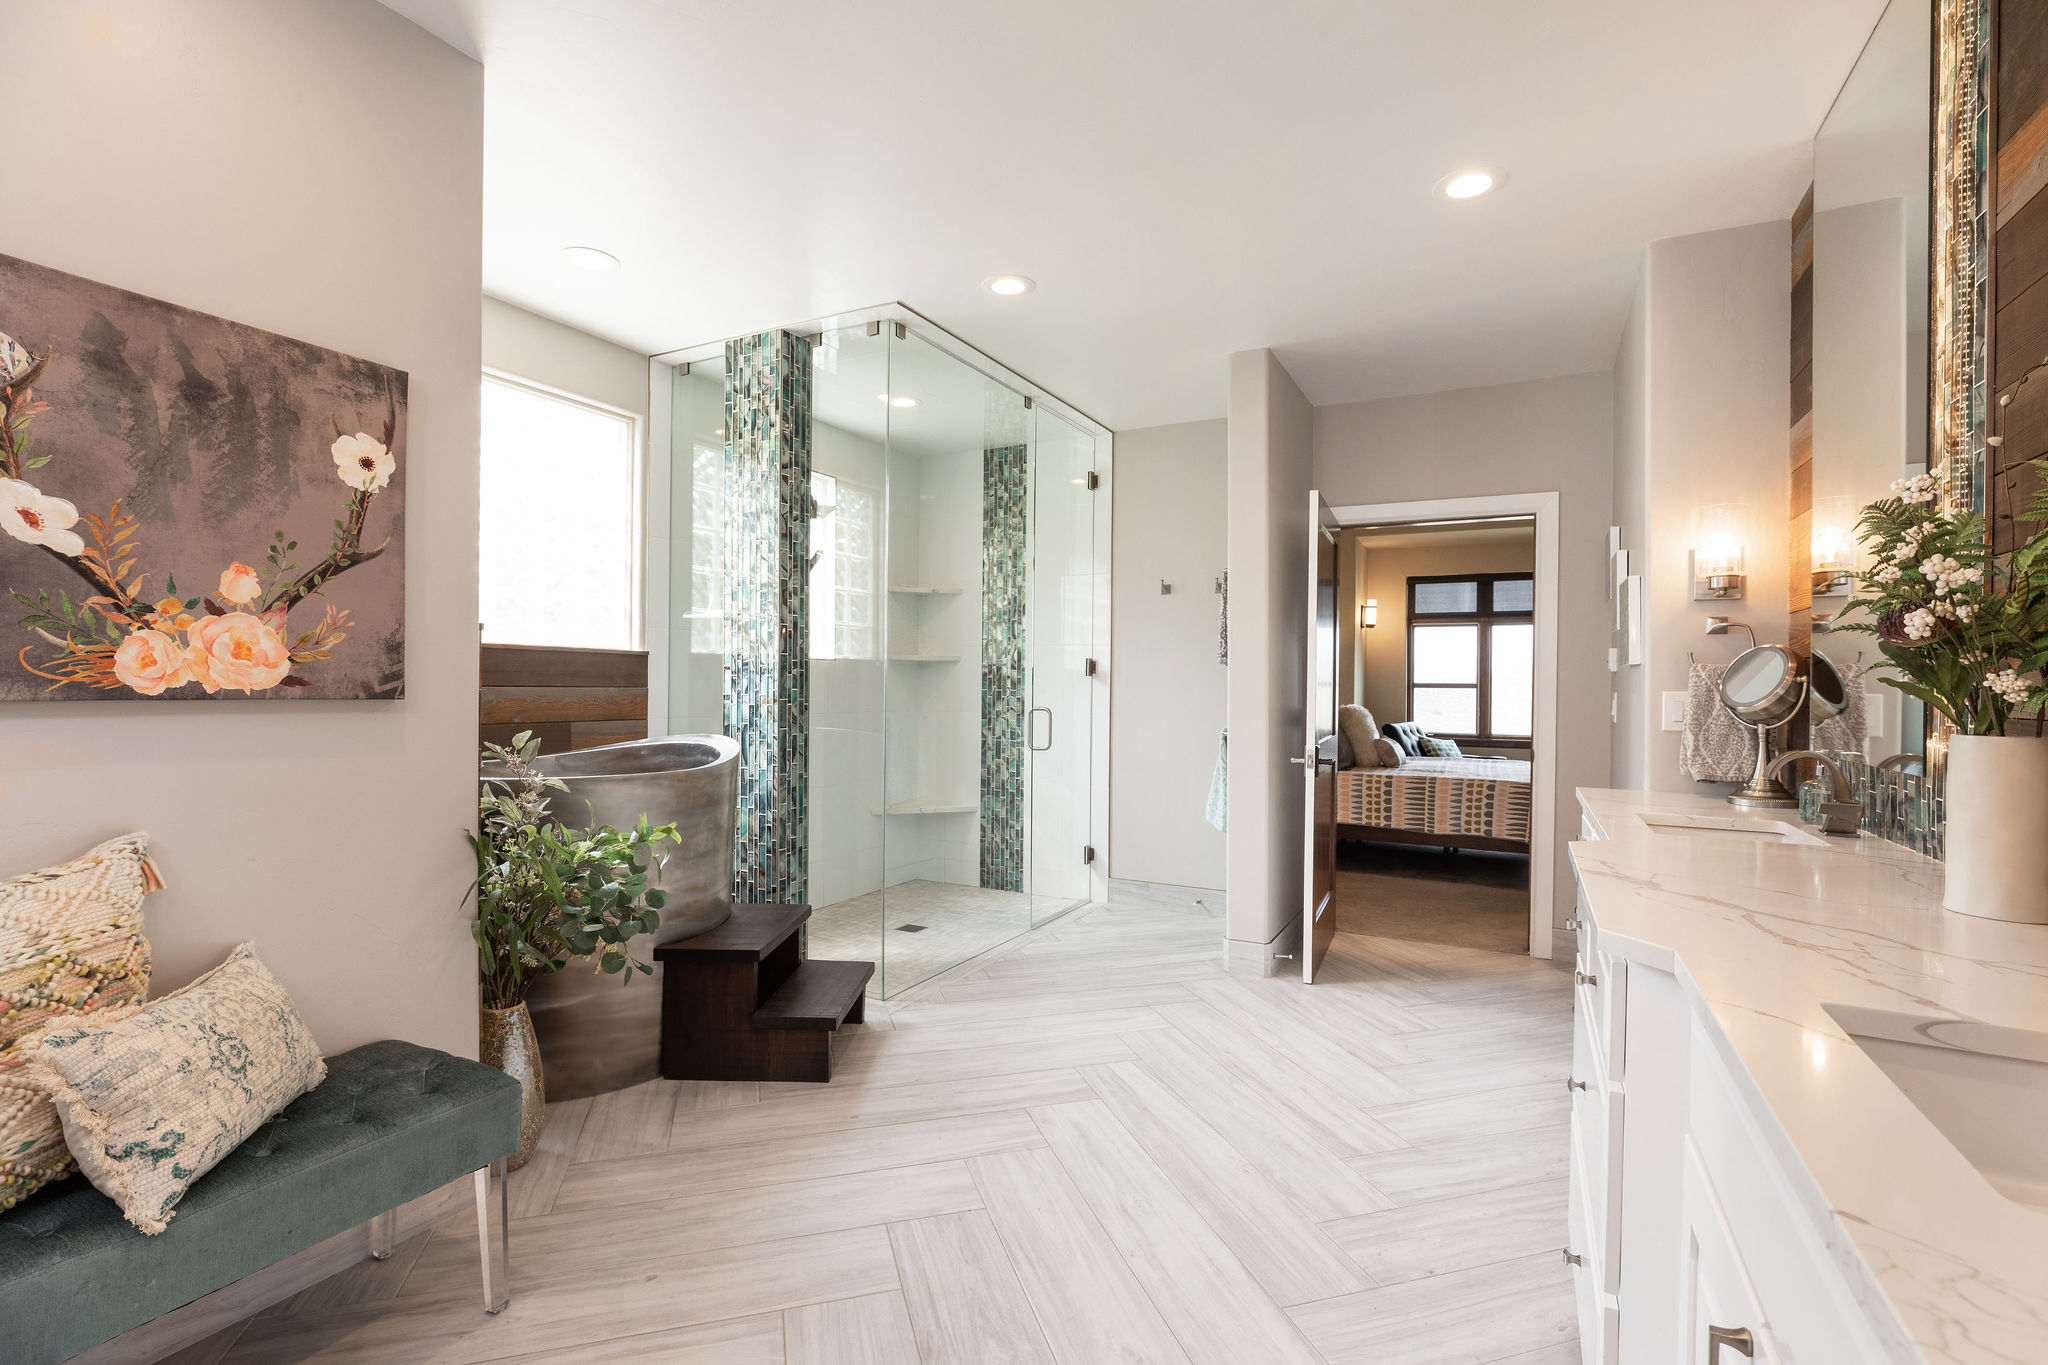 Luxury primary spa bathroom